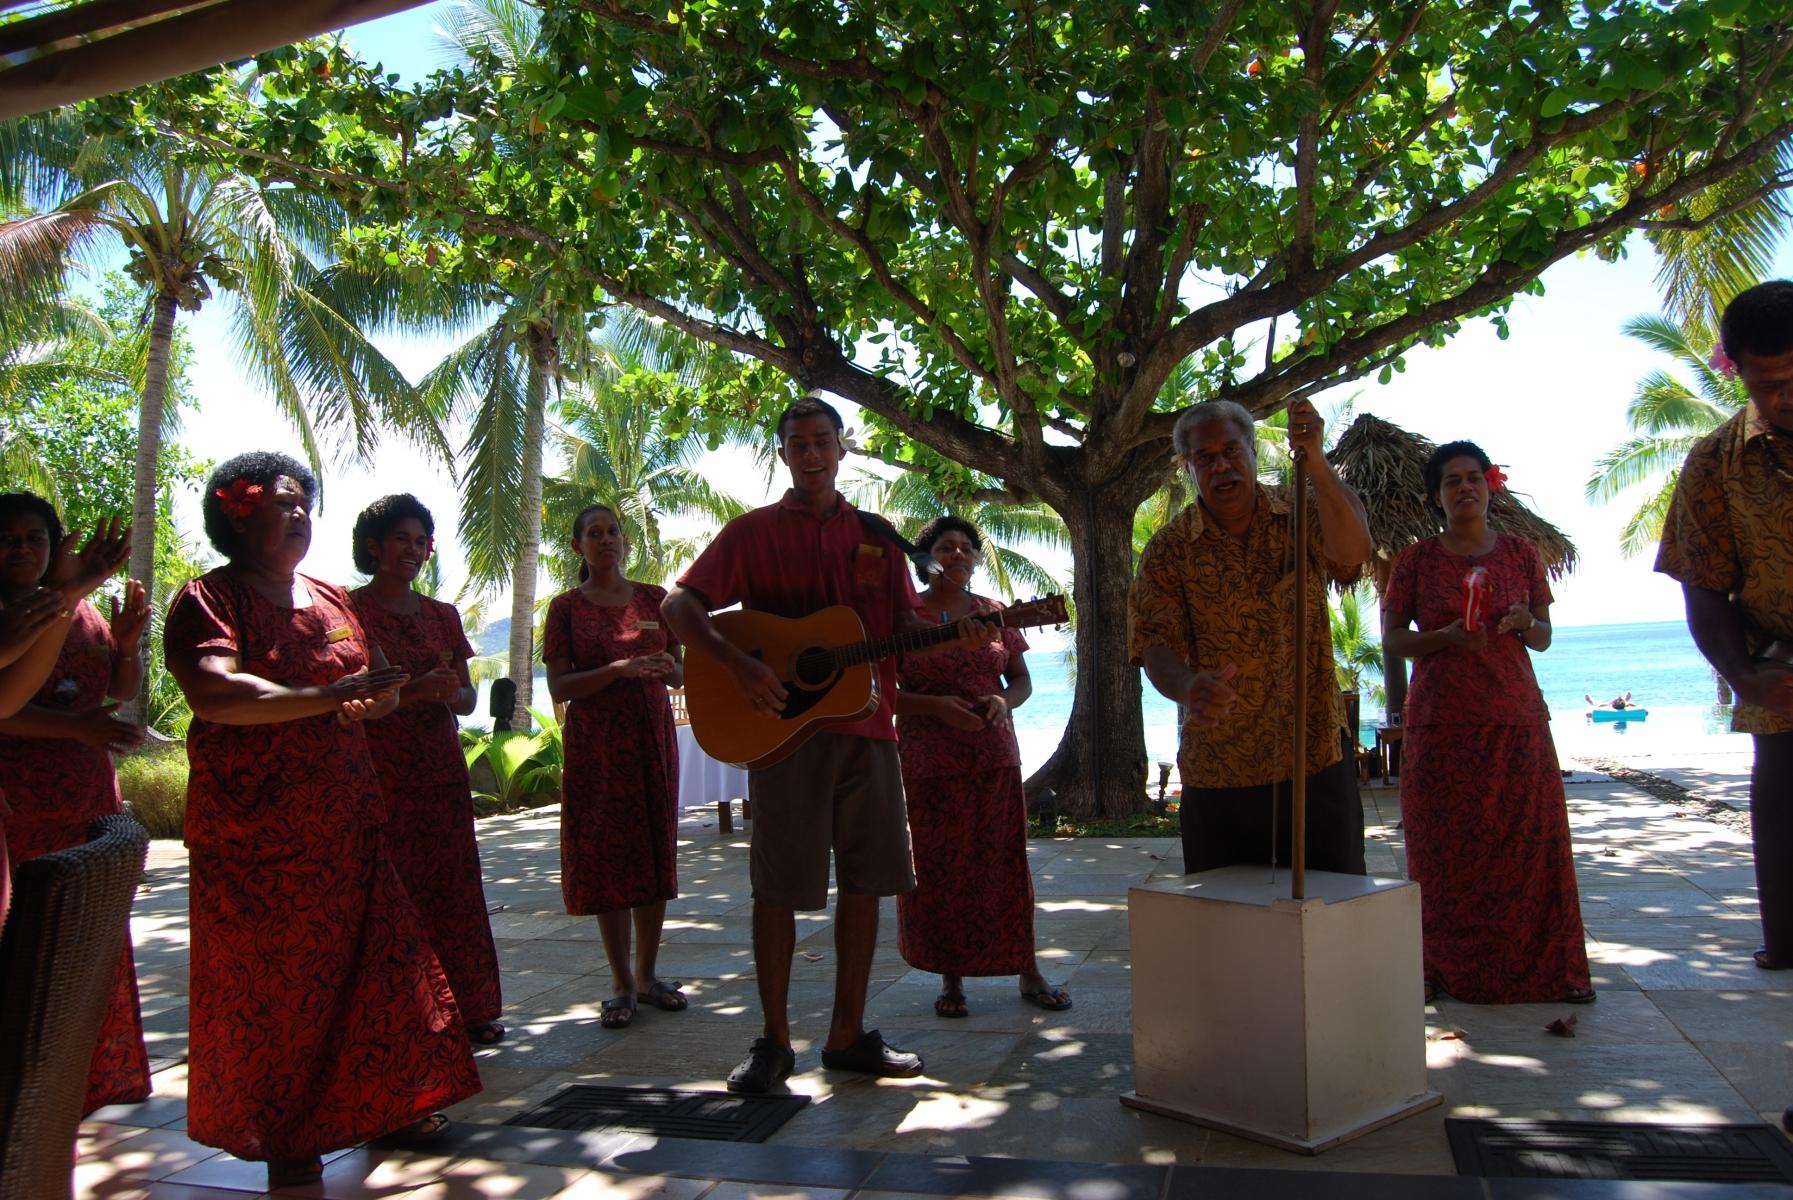 Tokoriki-Island-Resort-Fiji-2-1-2011-4-03-14-PM